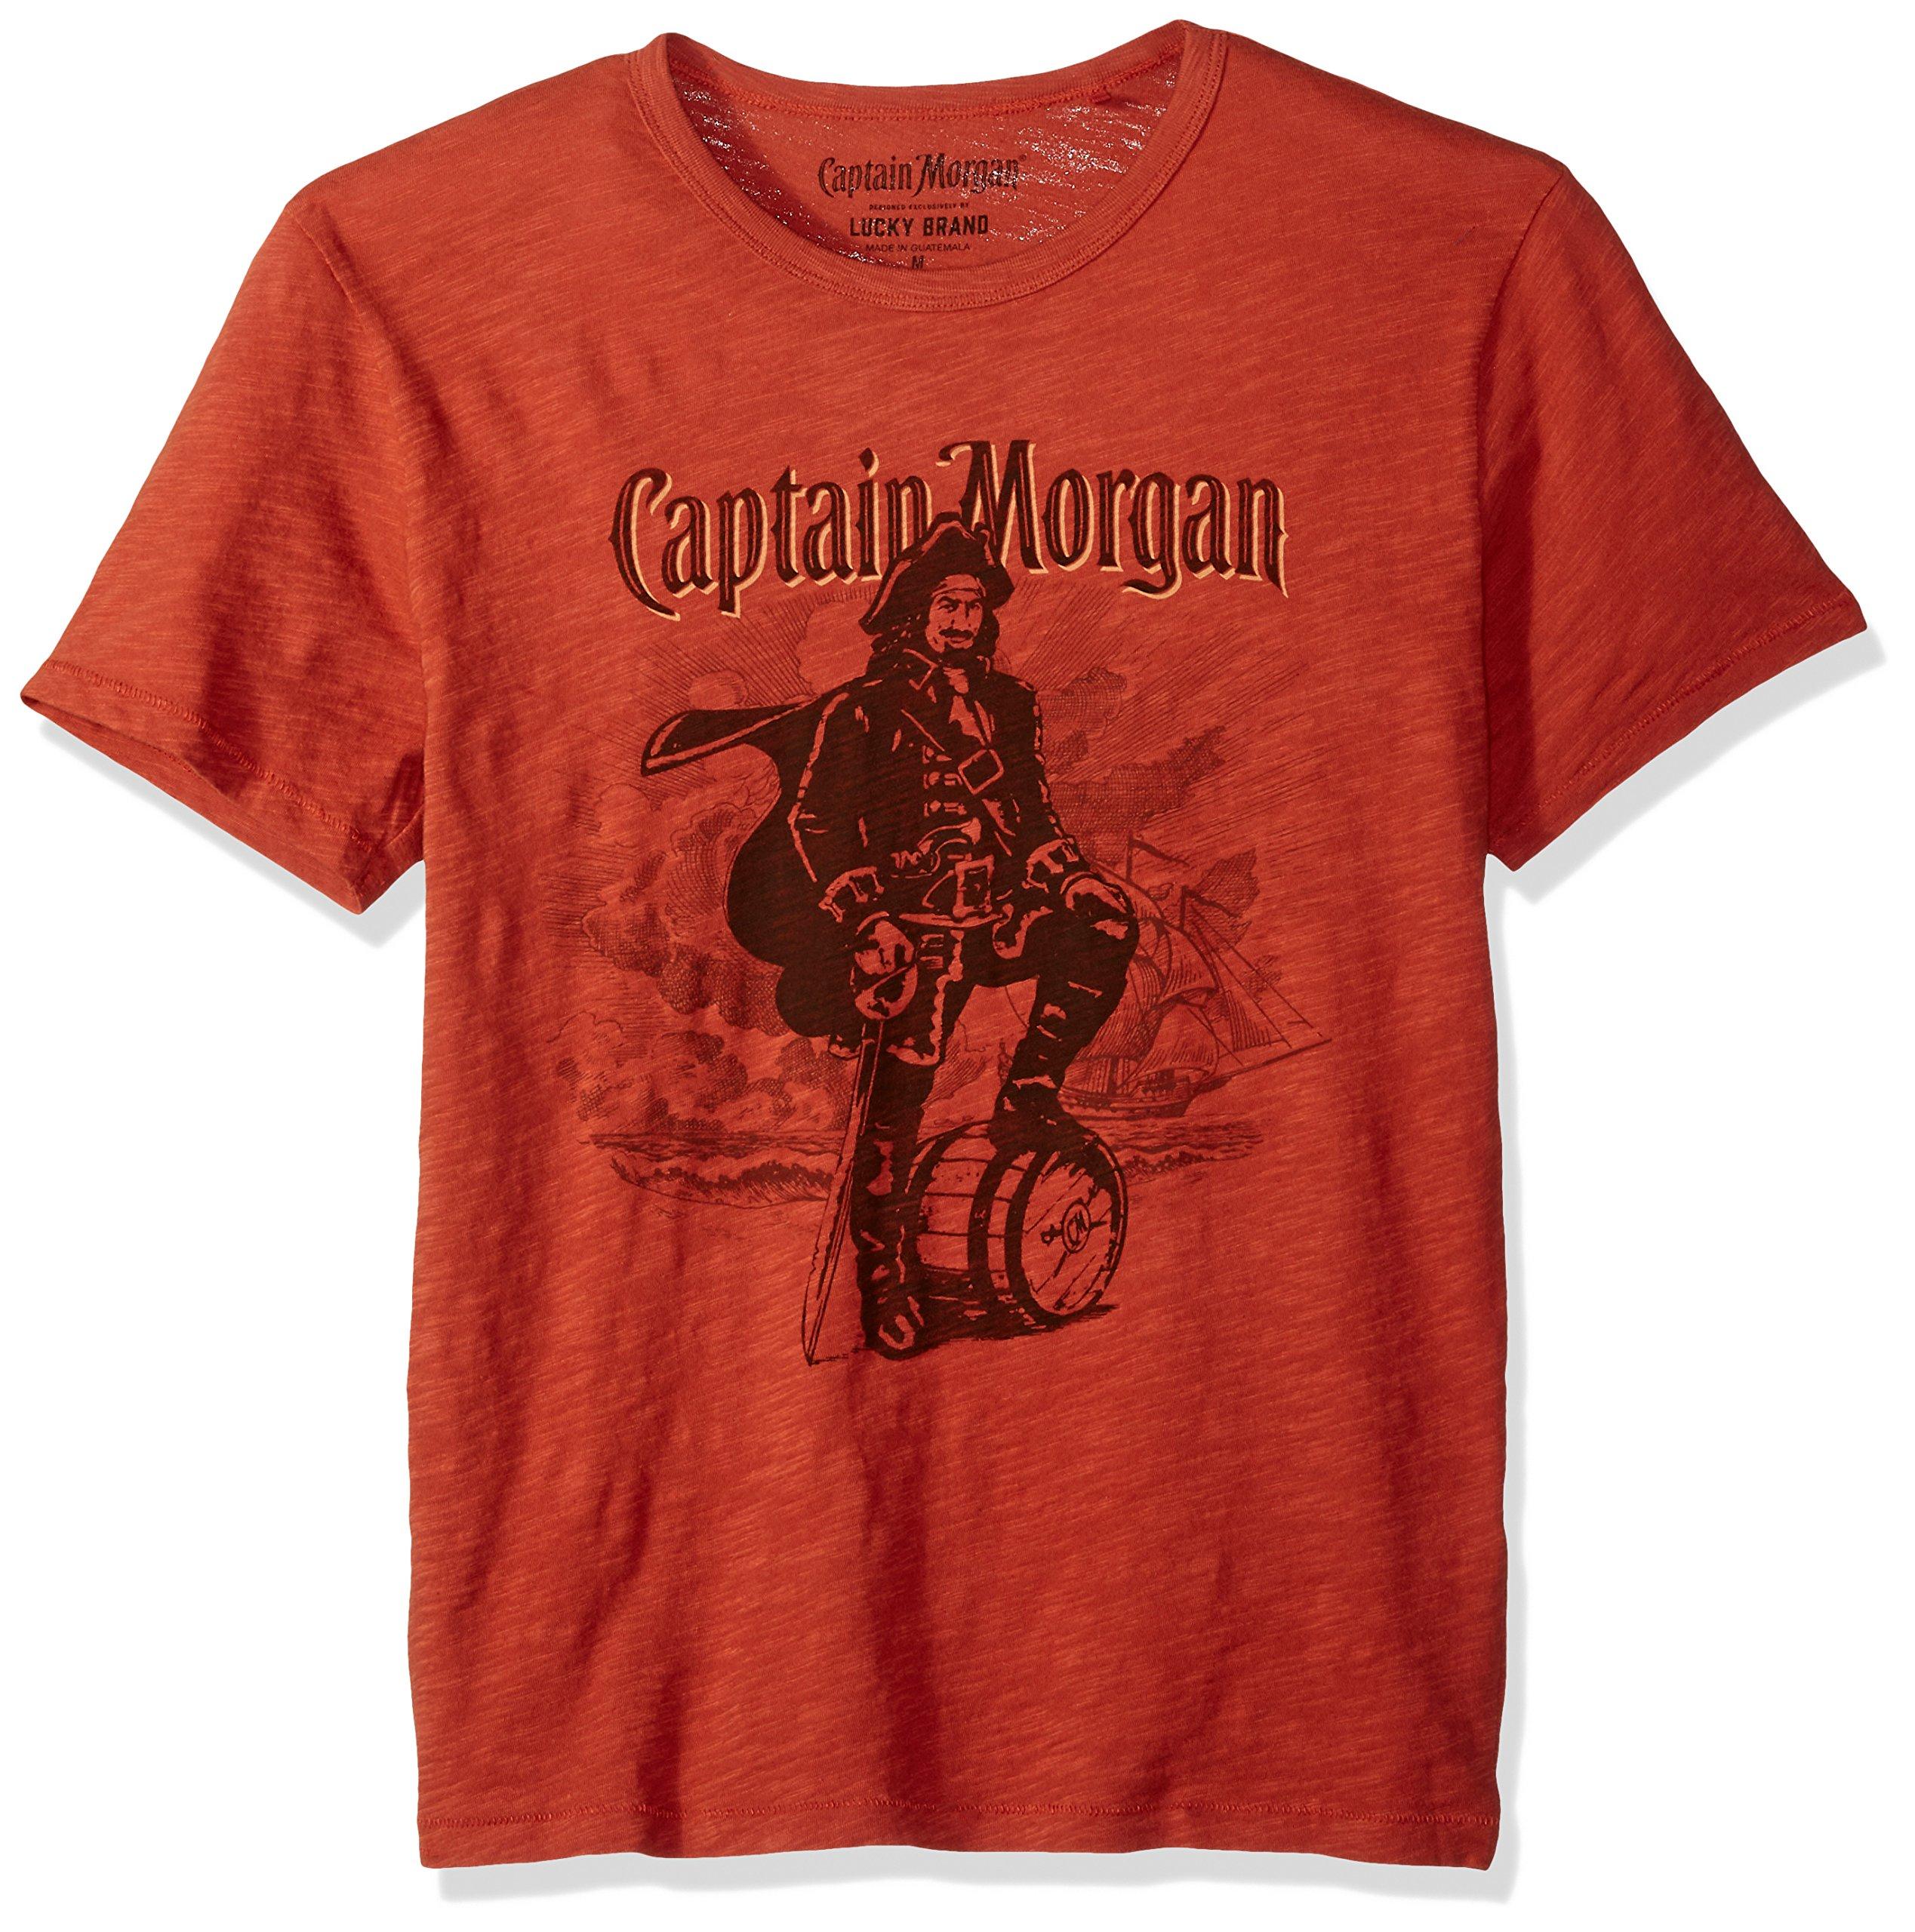 Lucky Brand Men's Captain Morgan Graphic Tee, Barn Red, S